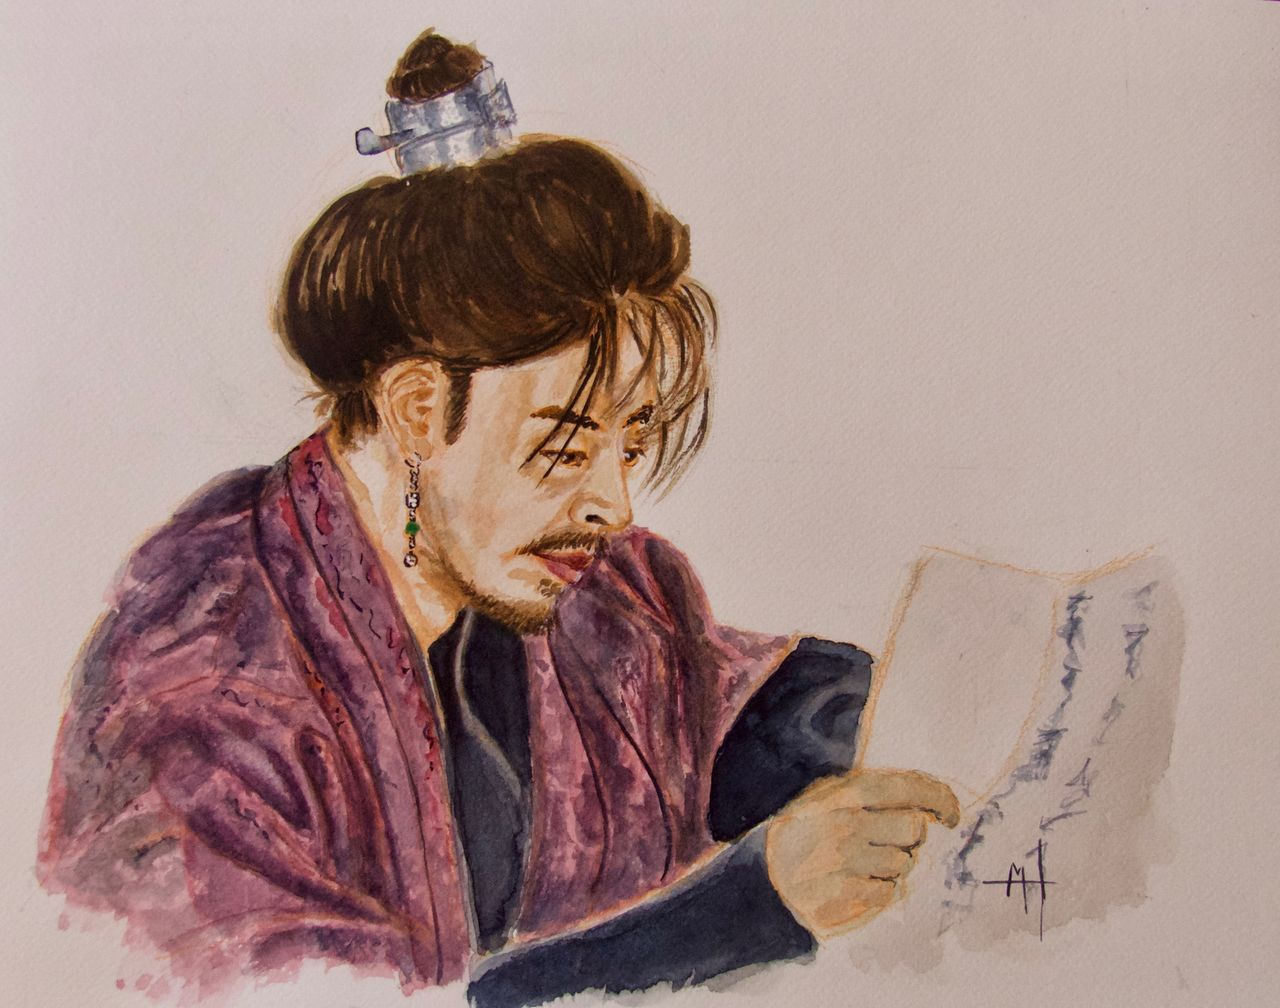 Marie-Hélène CLINCHAMPS Prince Jeong Ahn